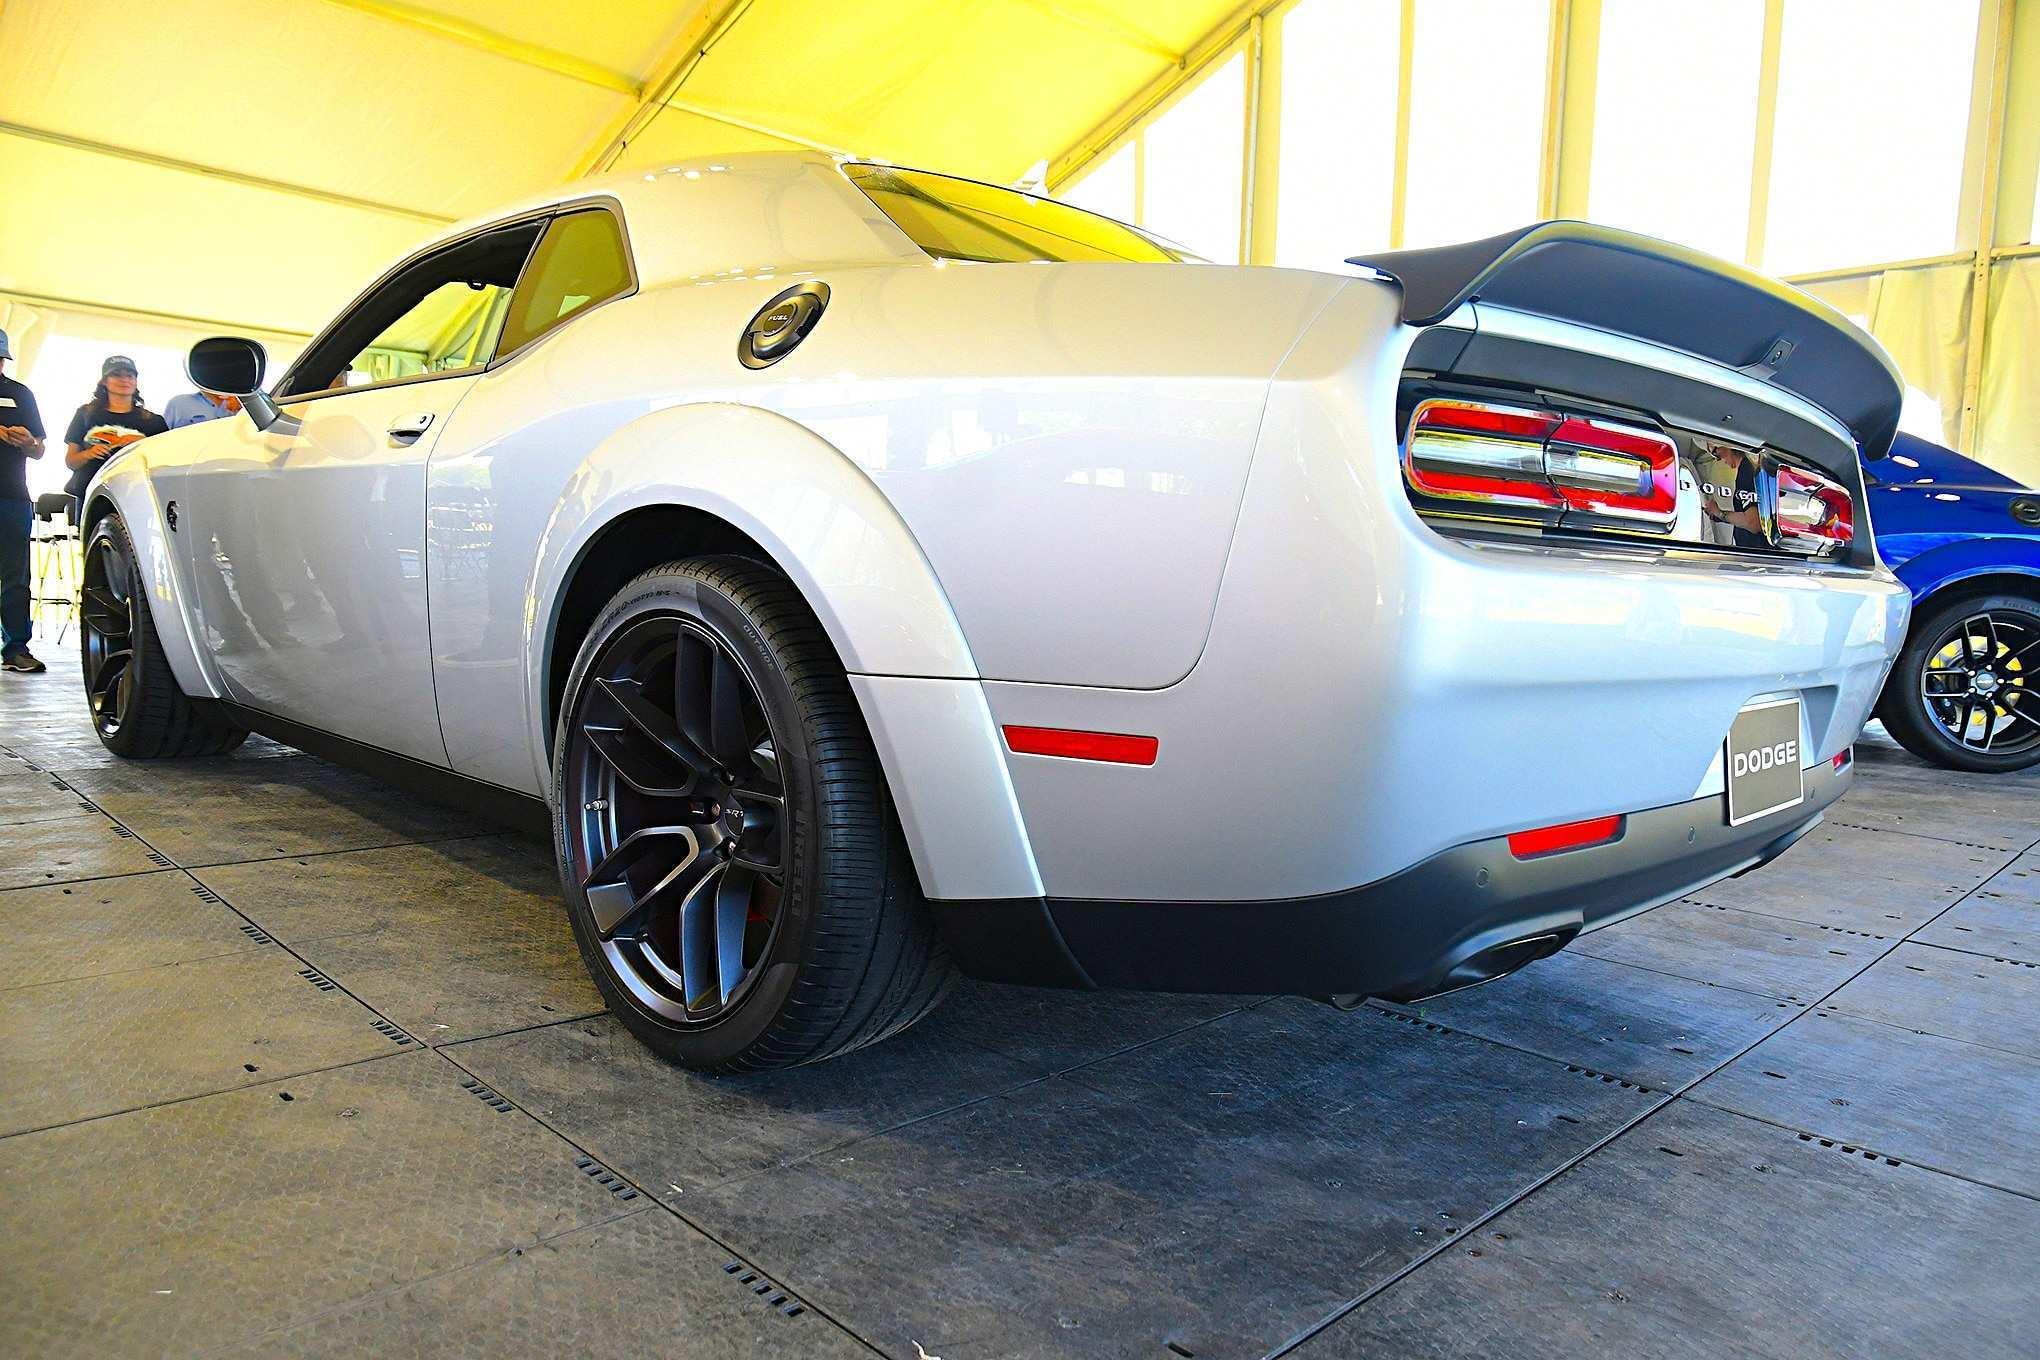 13 New New 2019 Dodge Challenger Hellcat Red Eye Performance Speed Test with New 2019 Dodge Challenger Hellcat Red Eye Performance